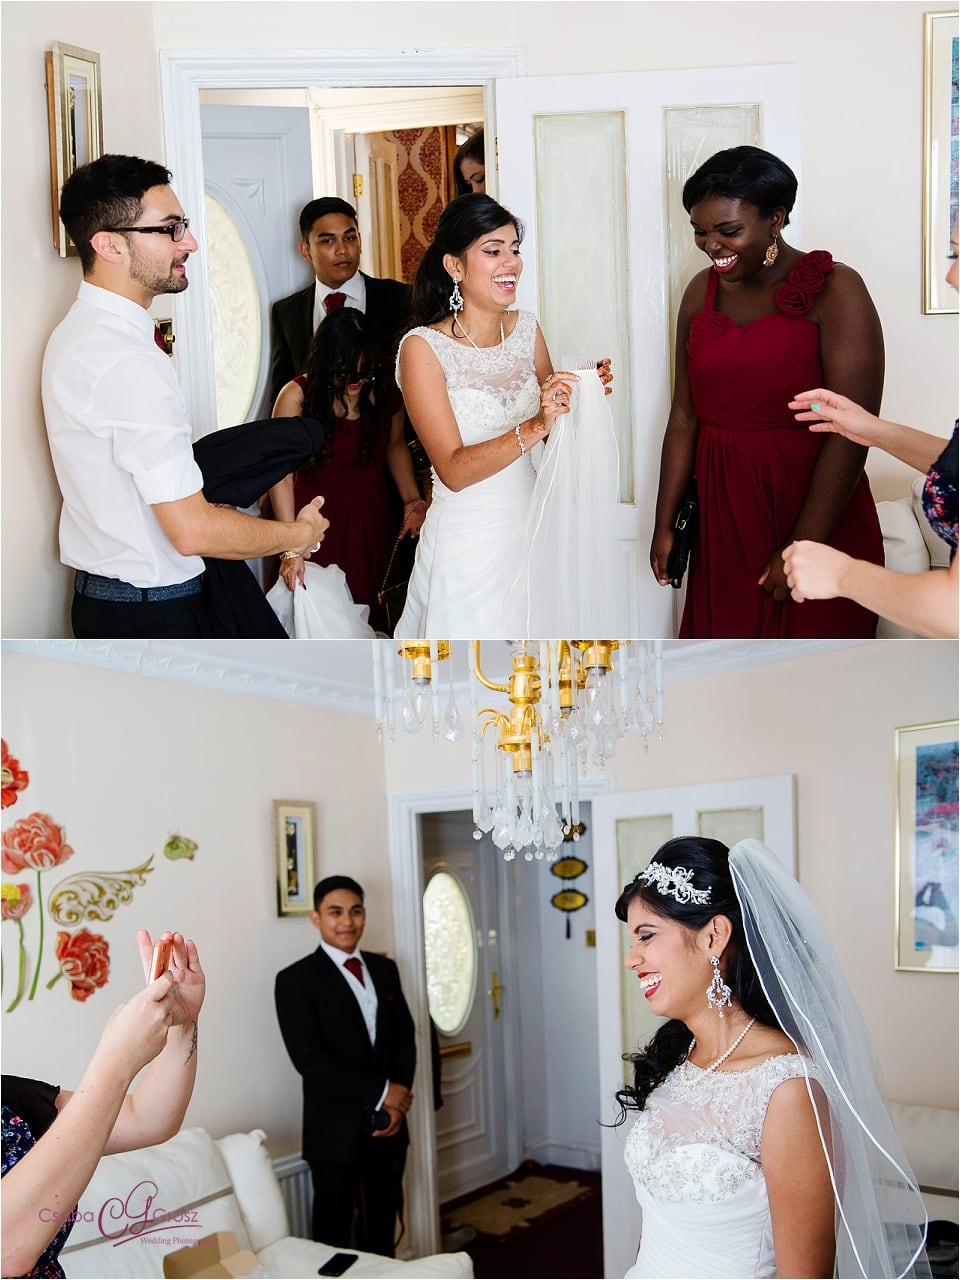 Parveen_Joseph_Wedding_at_Epsom_Downs_Wedding_Photographer_40